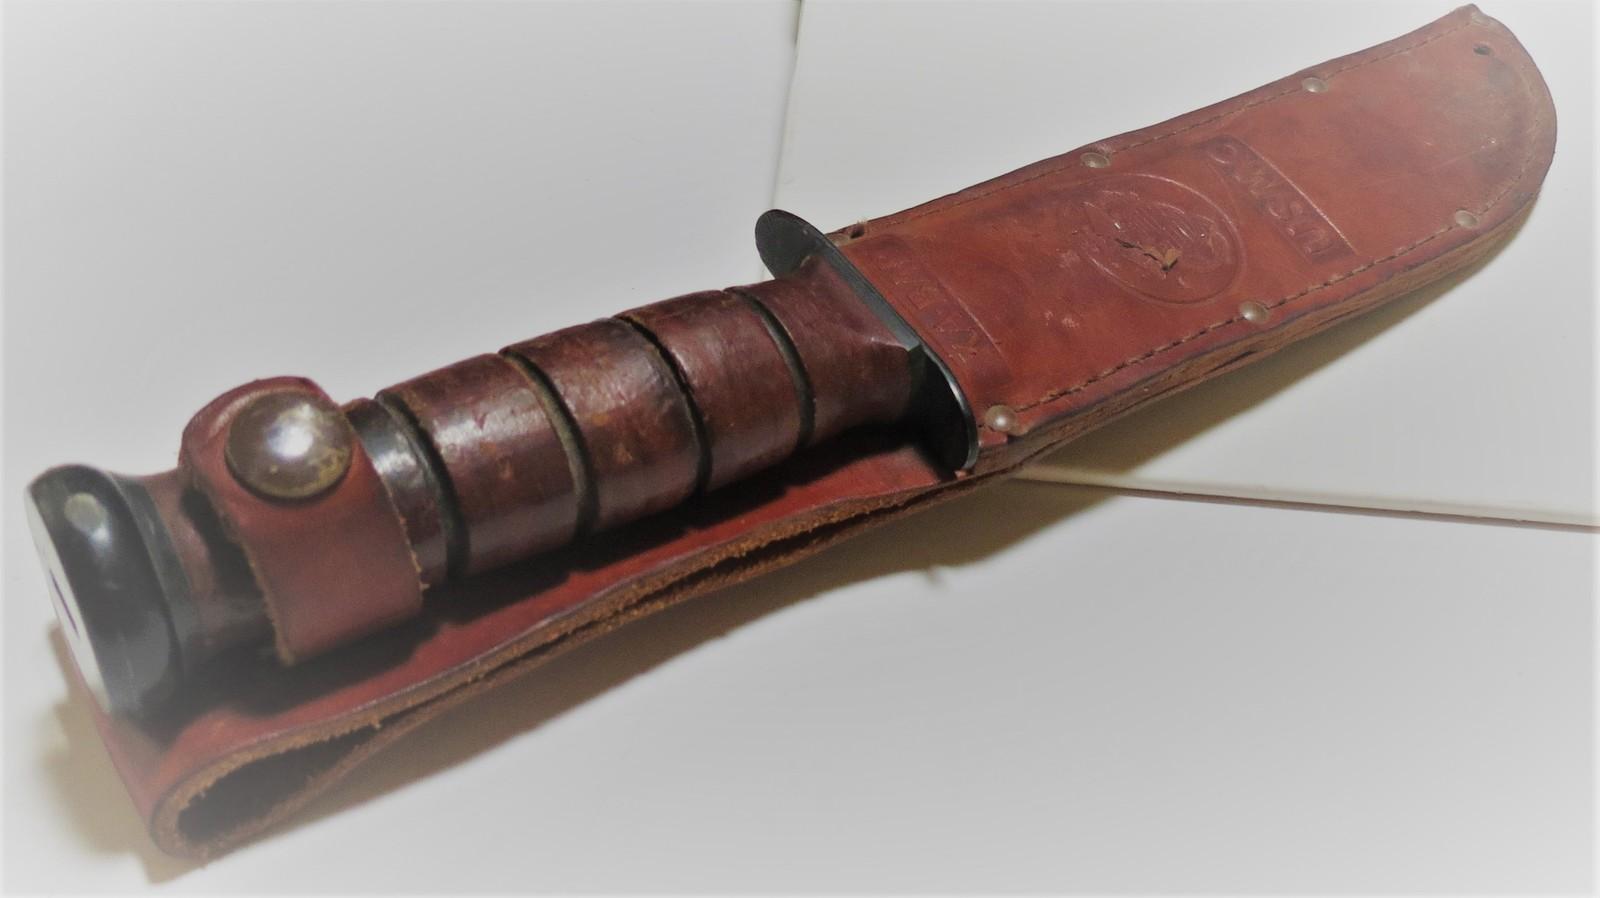 WW11 USMC Knife with leather sheath. Engraved with name of Marine image 2